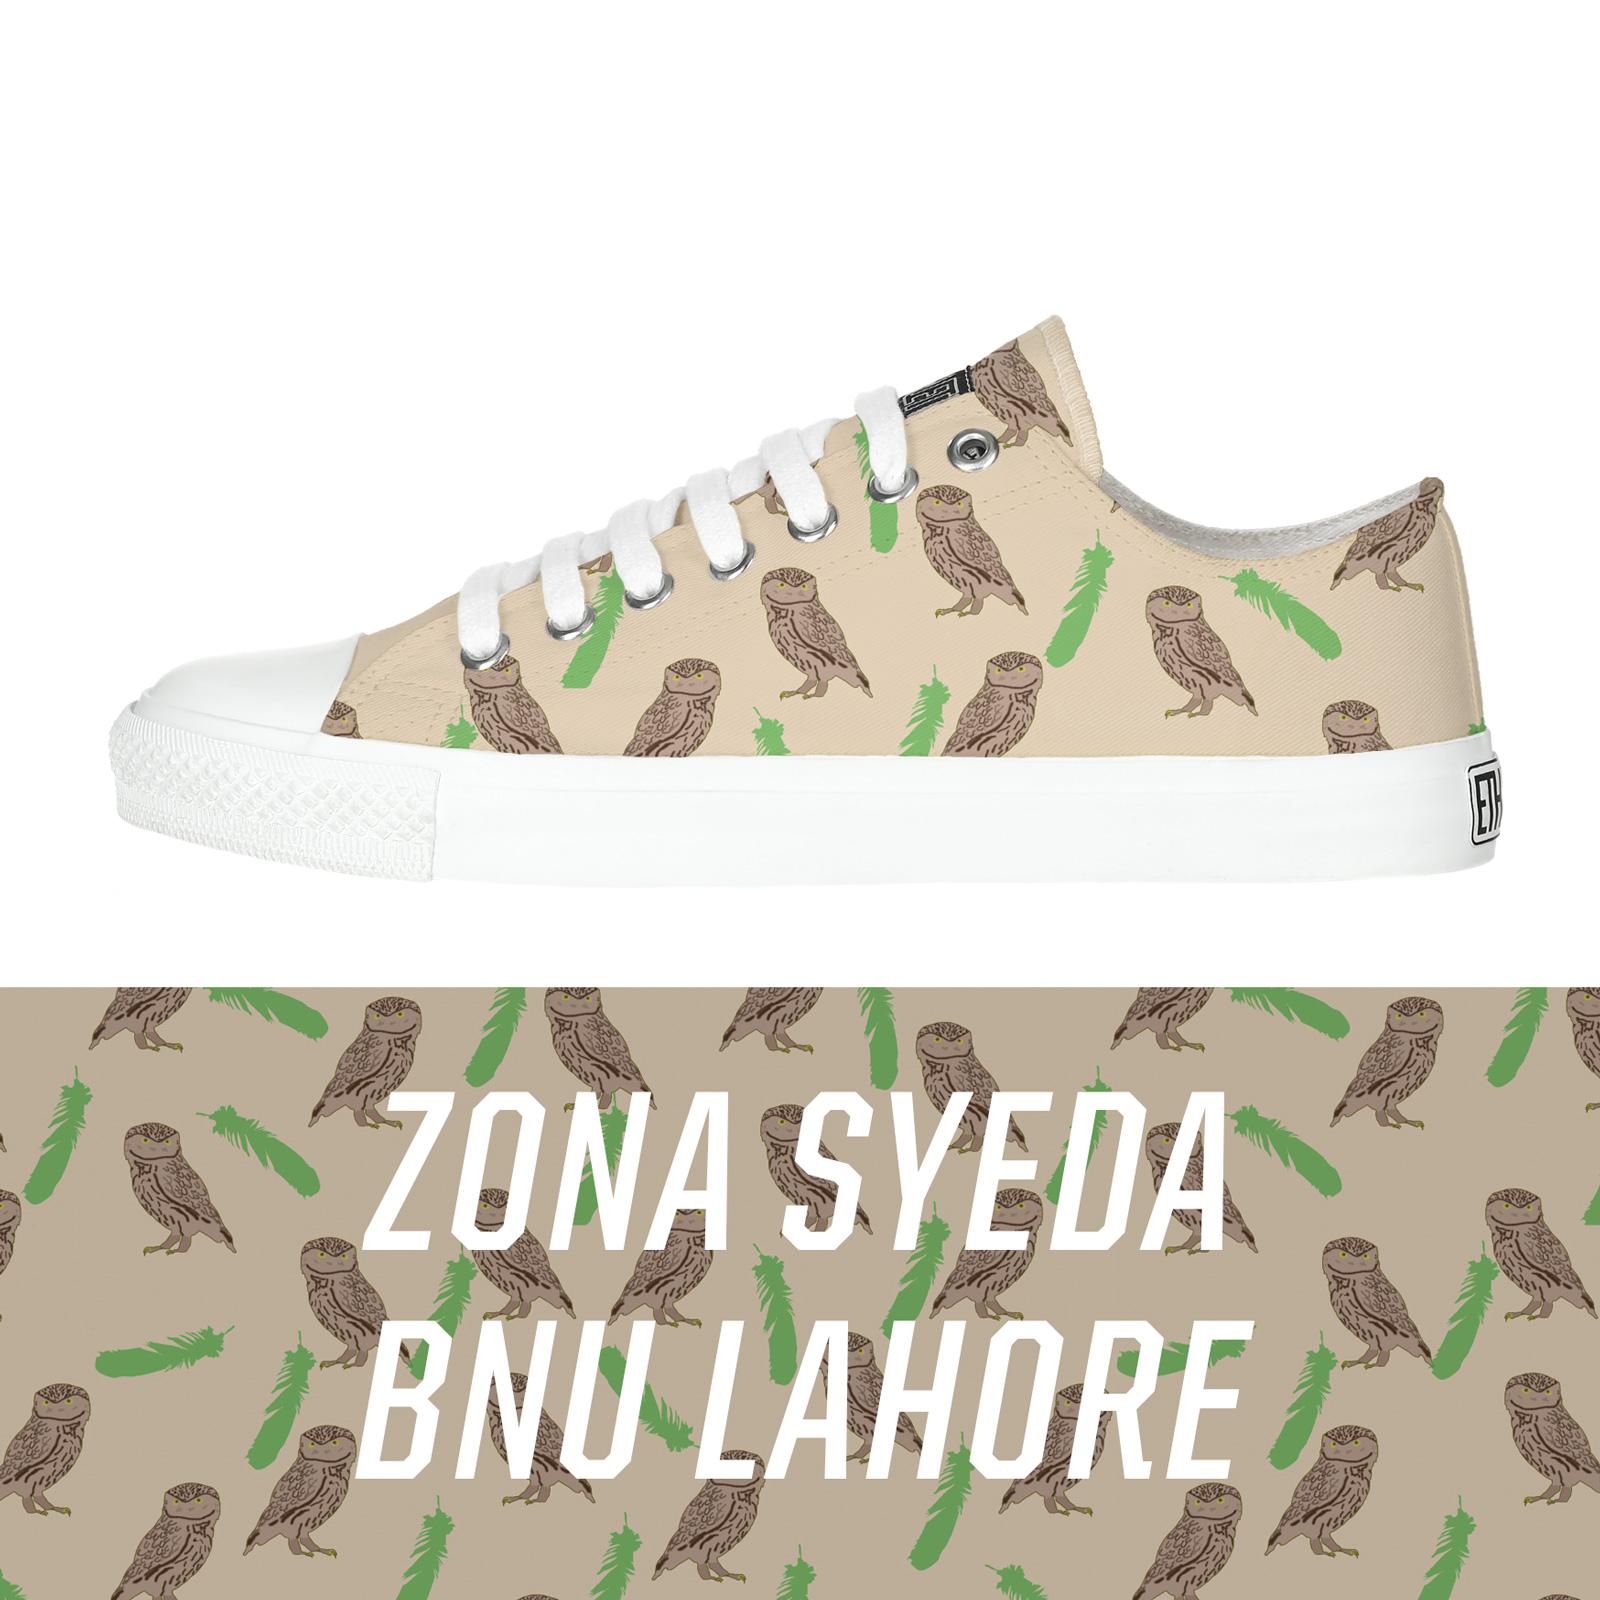 Zona_Syeda